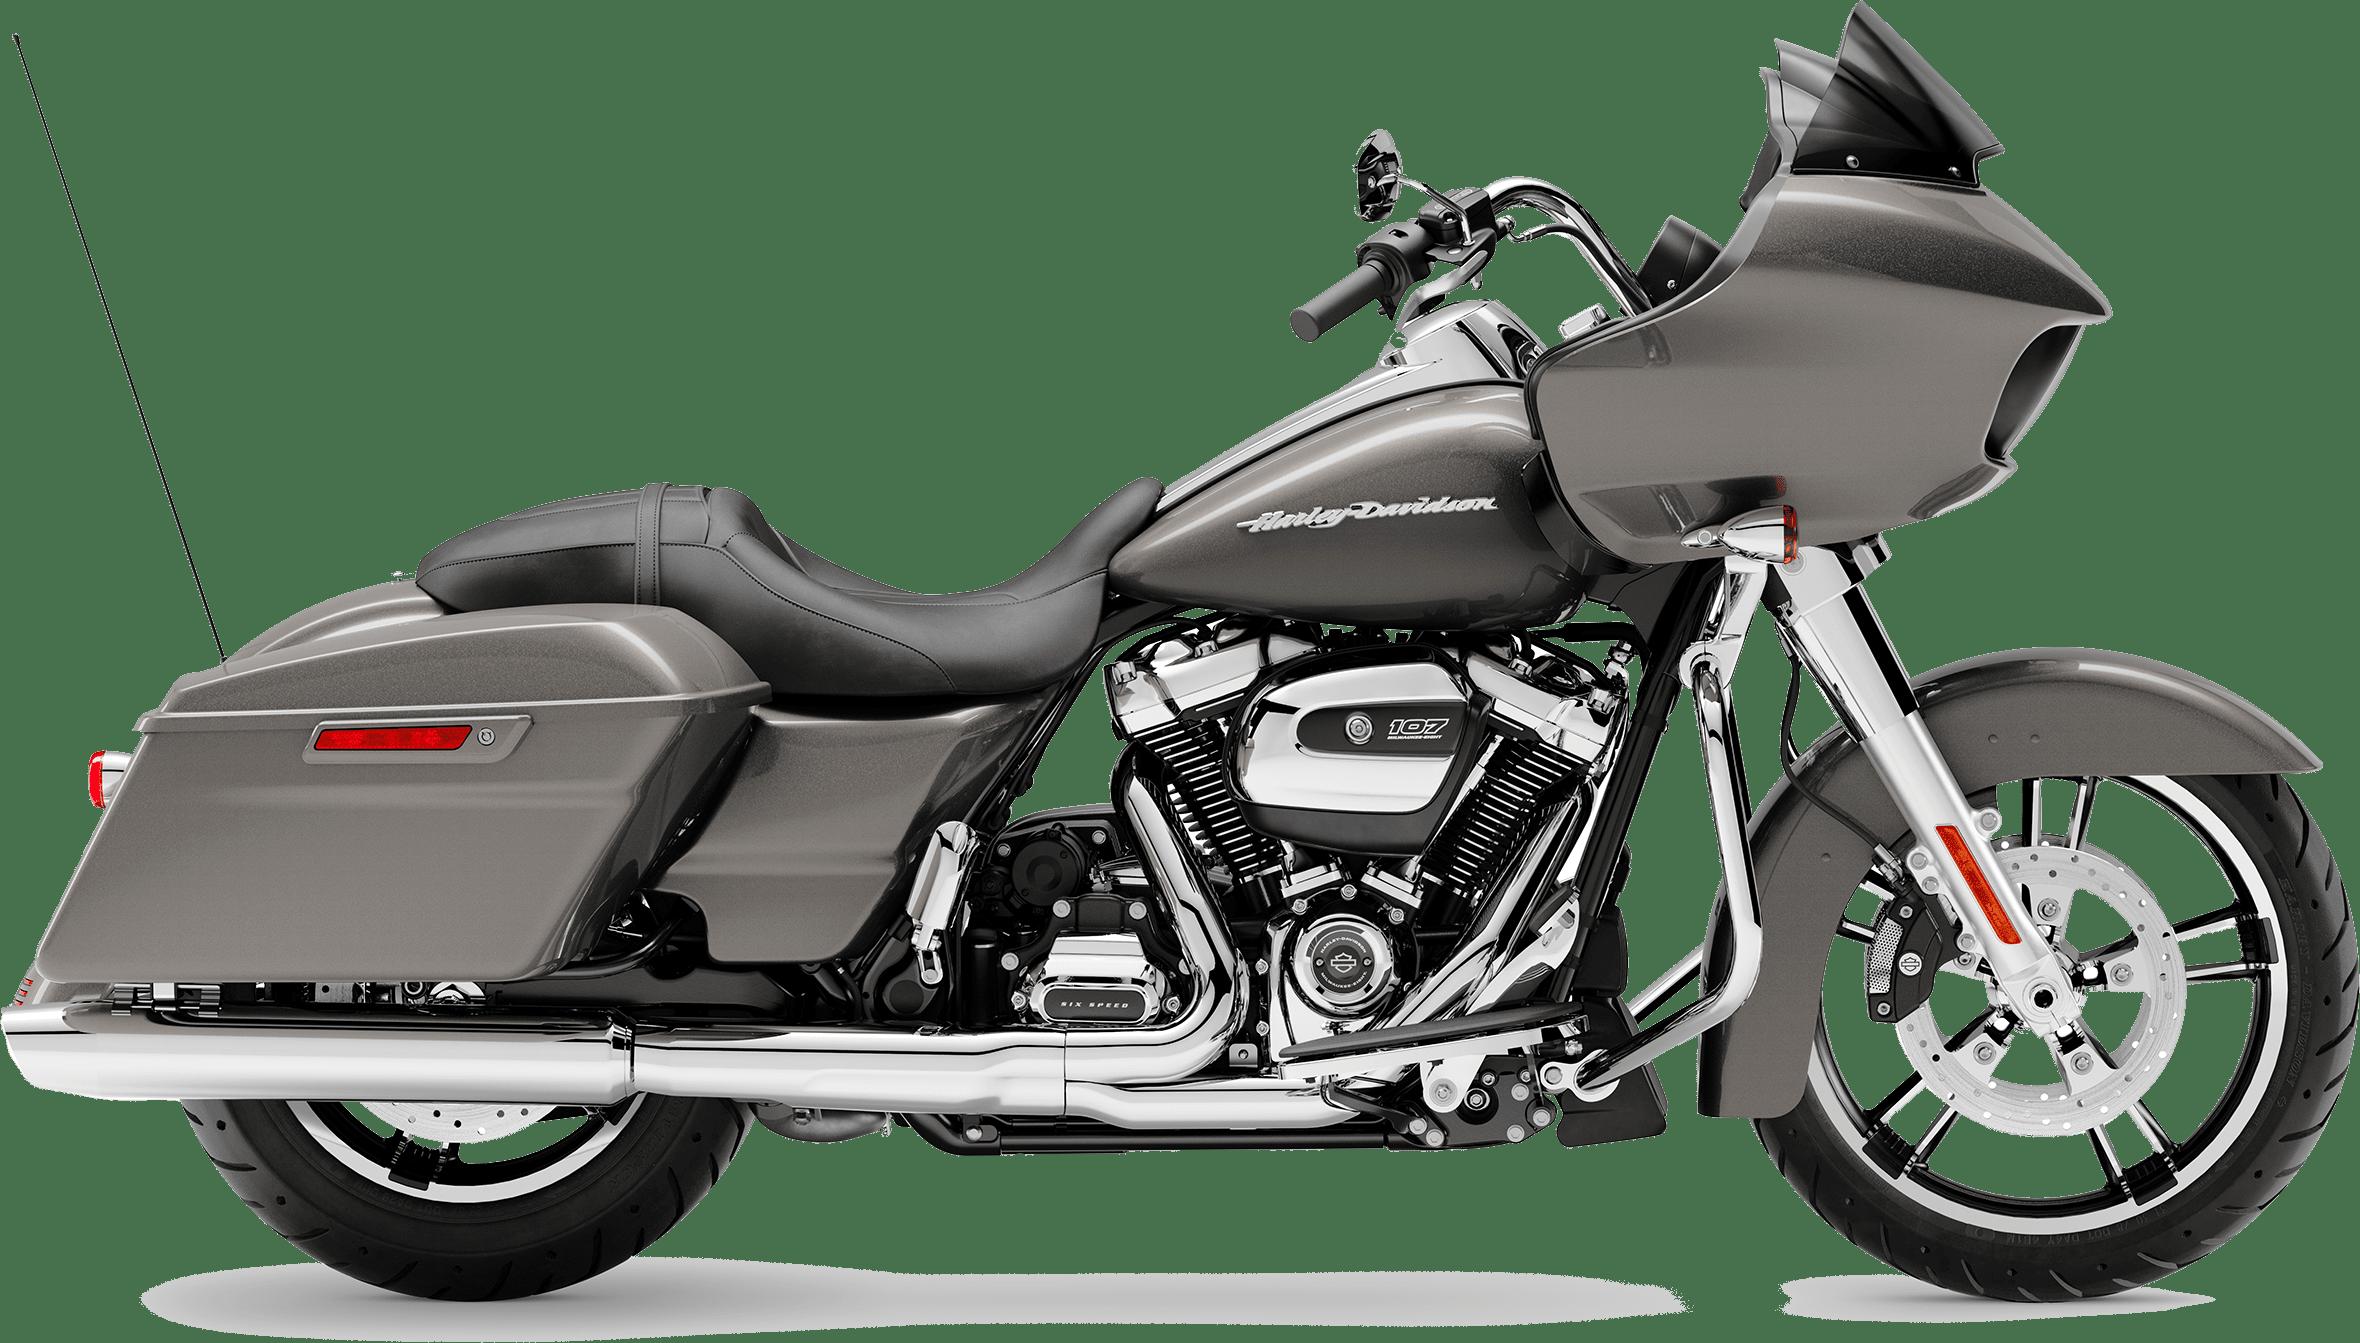 2019 Harley-Davidson H-D Touring Road Glide Industrial Grey